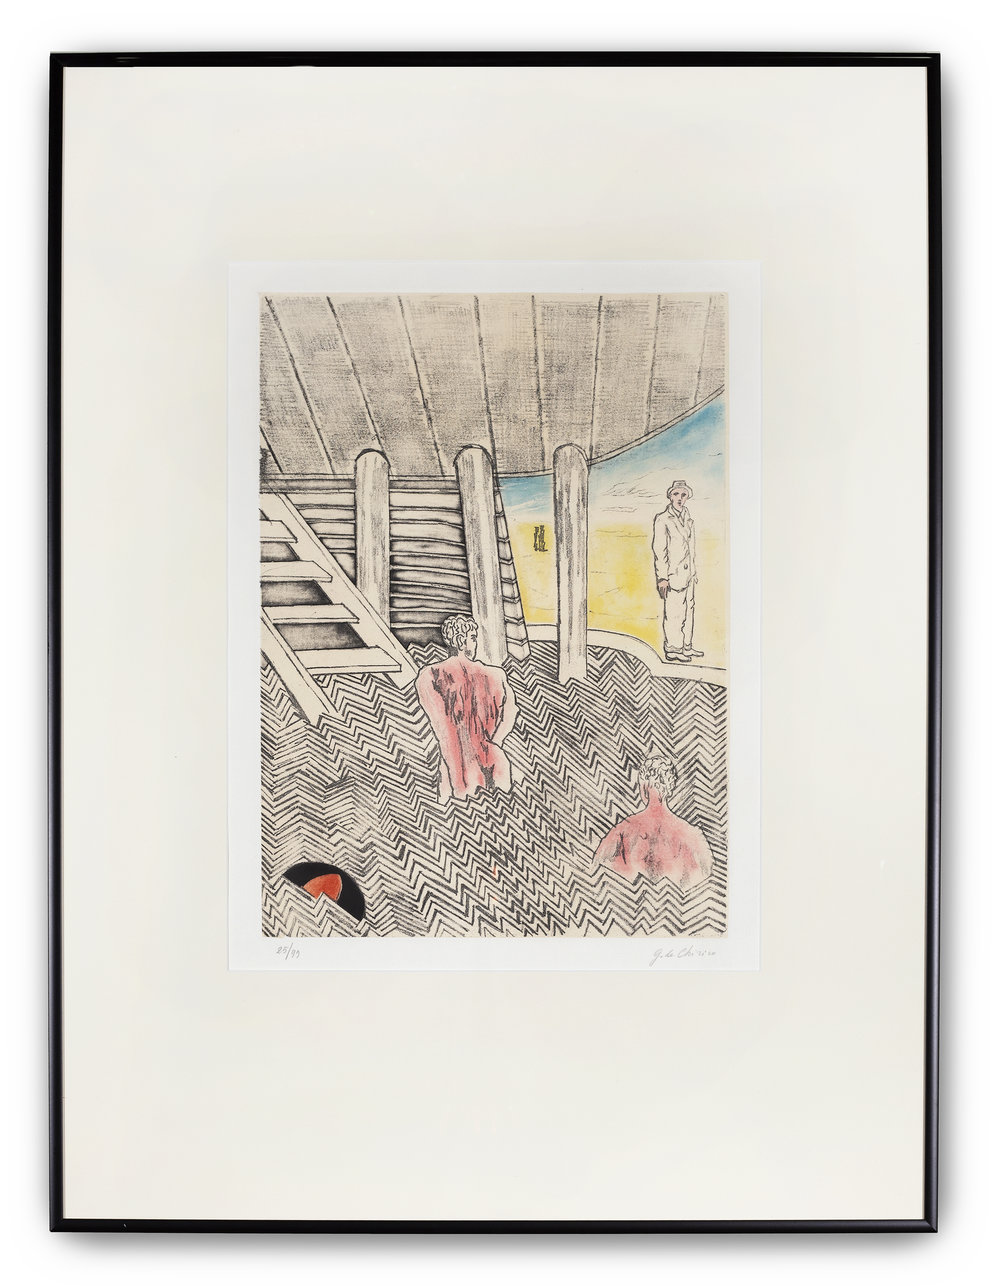 Georgio de Chirico, (Italian 1888-1978), Bagni Misteriosi, 1973.